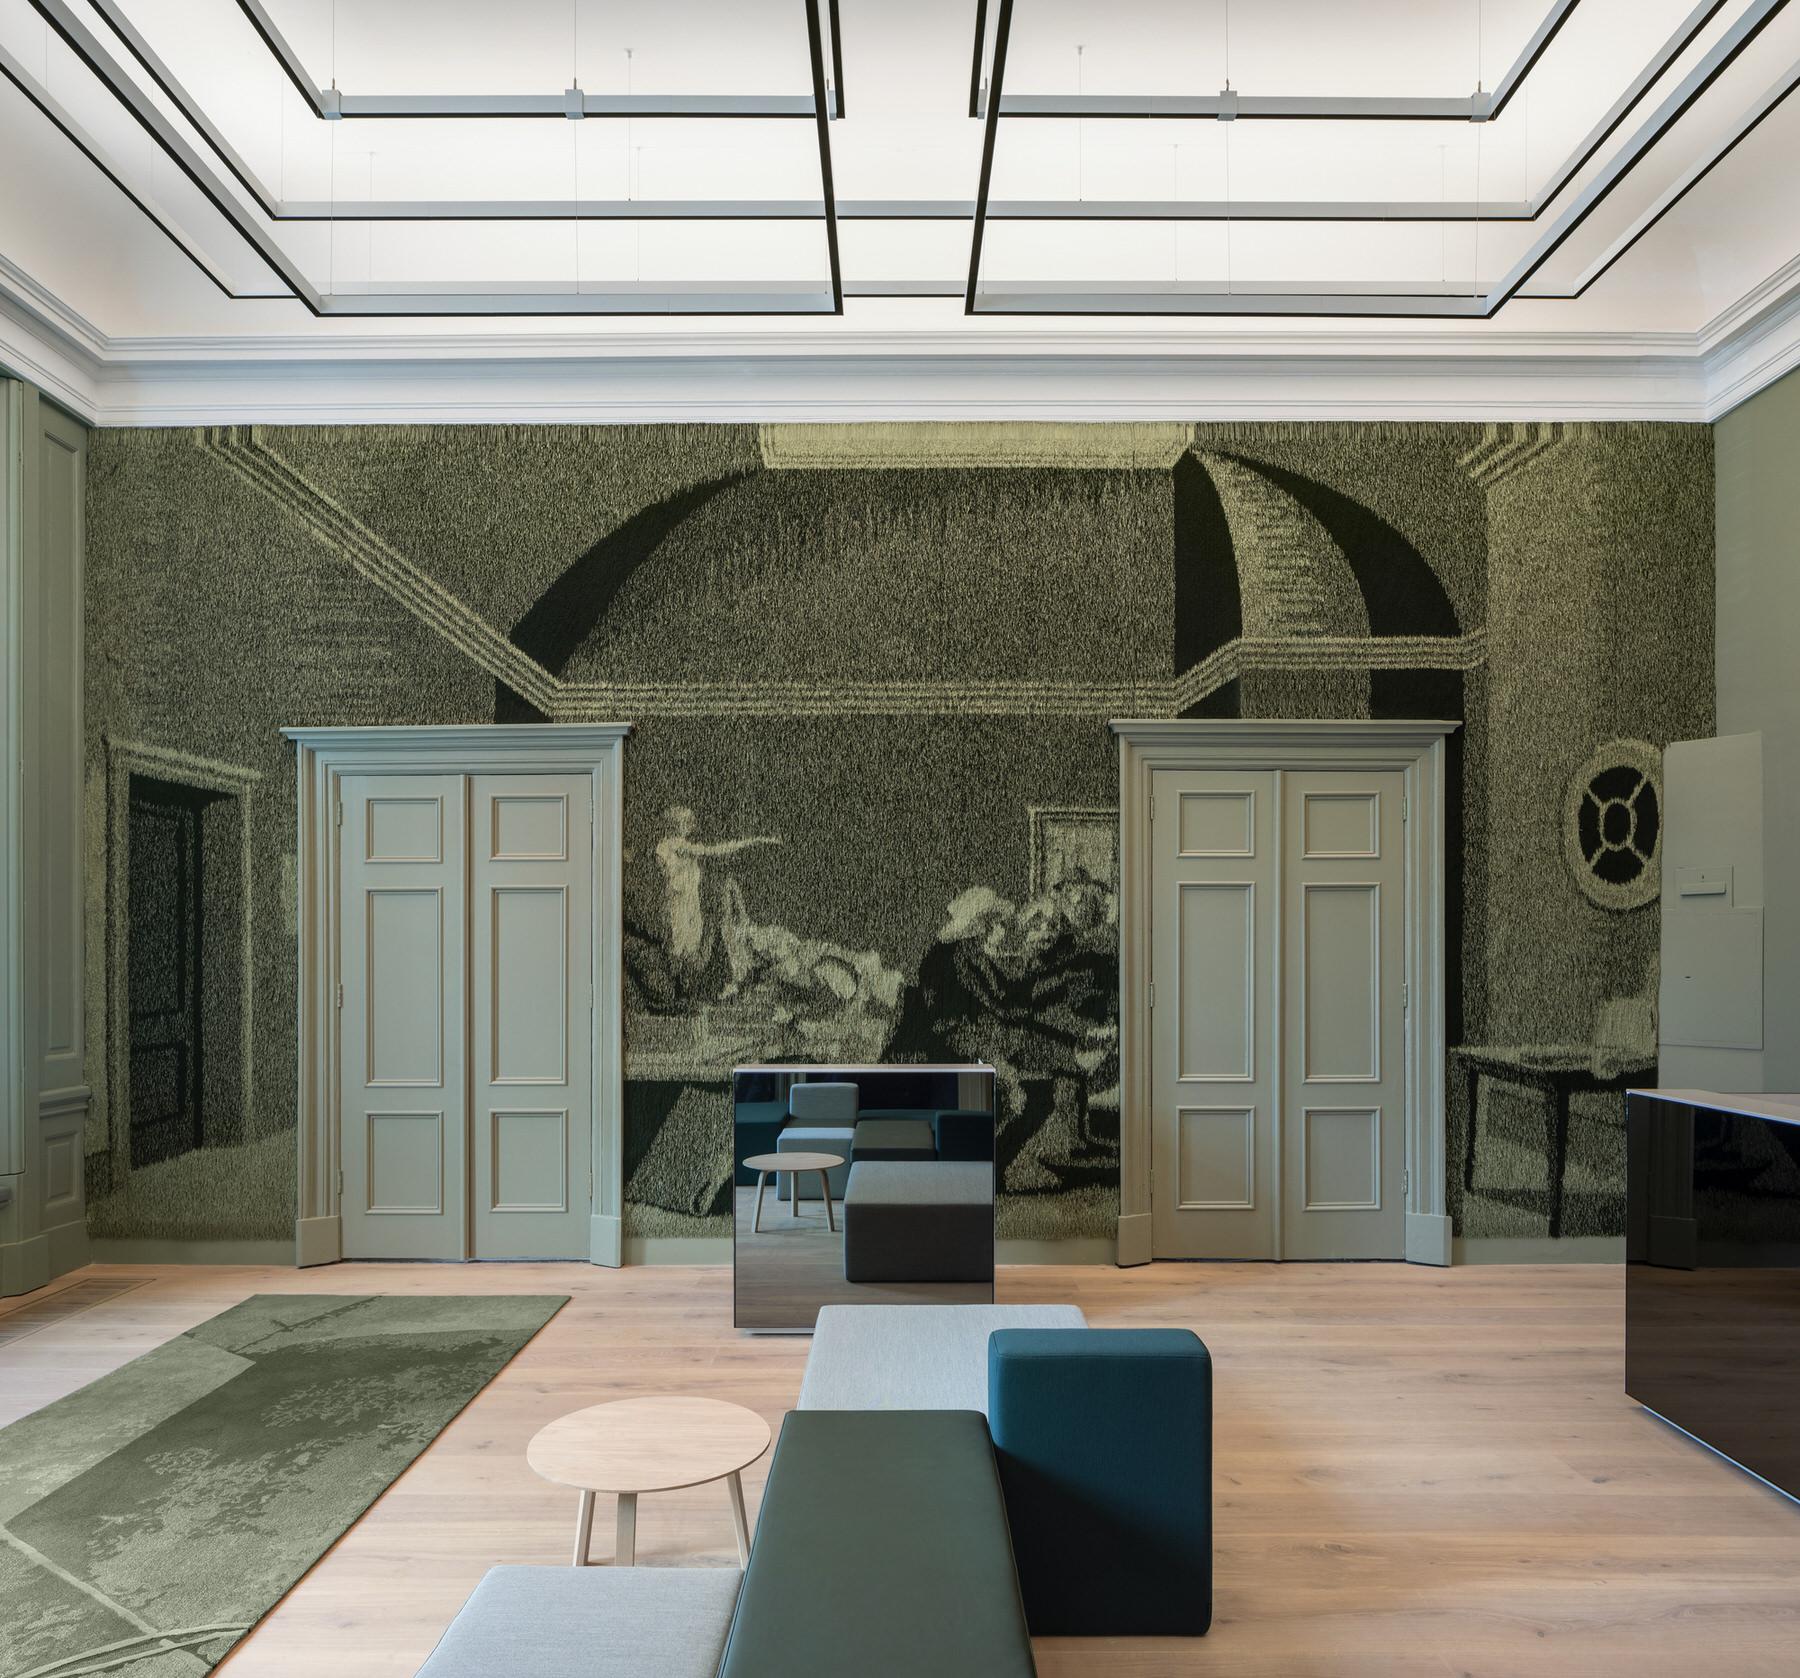 Entree, Felix Meritis Renovation, Amsterdam, I29 | Yellowtrace